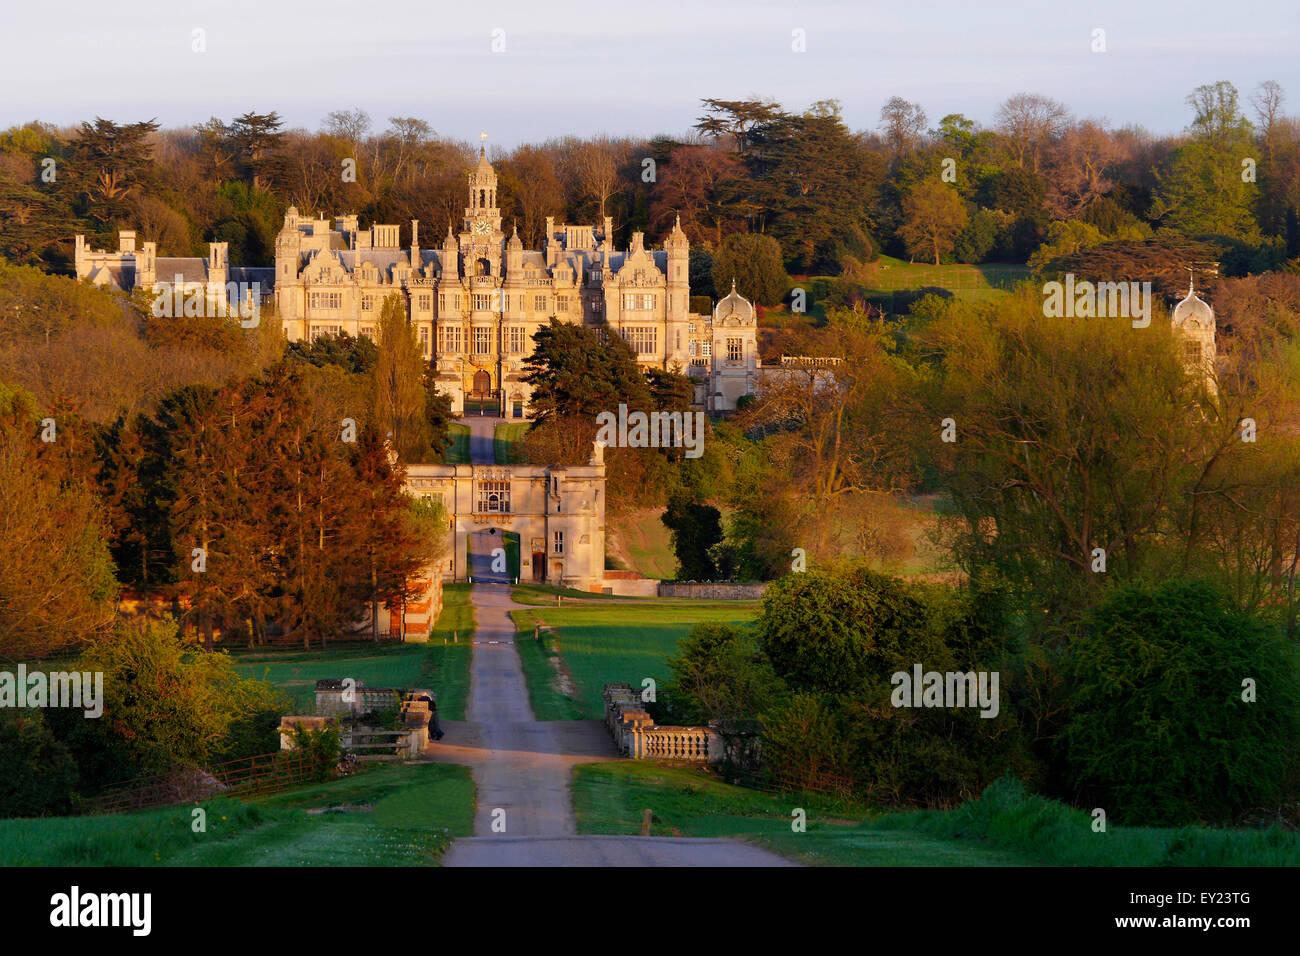 Harlaxton Manor, Grantham, Lincolnshire, England, UK - Stock Image